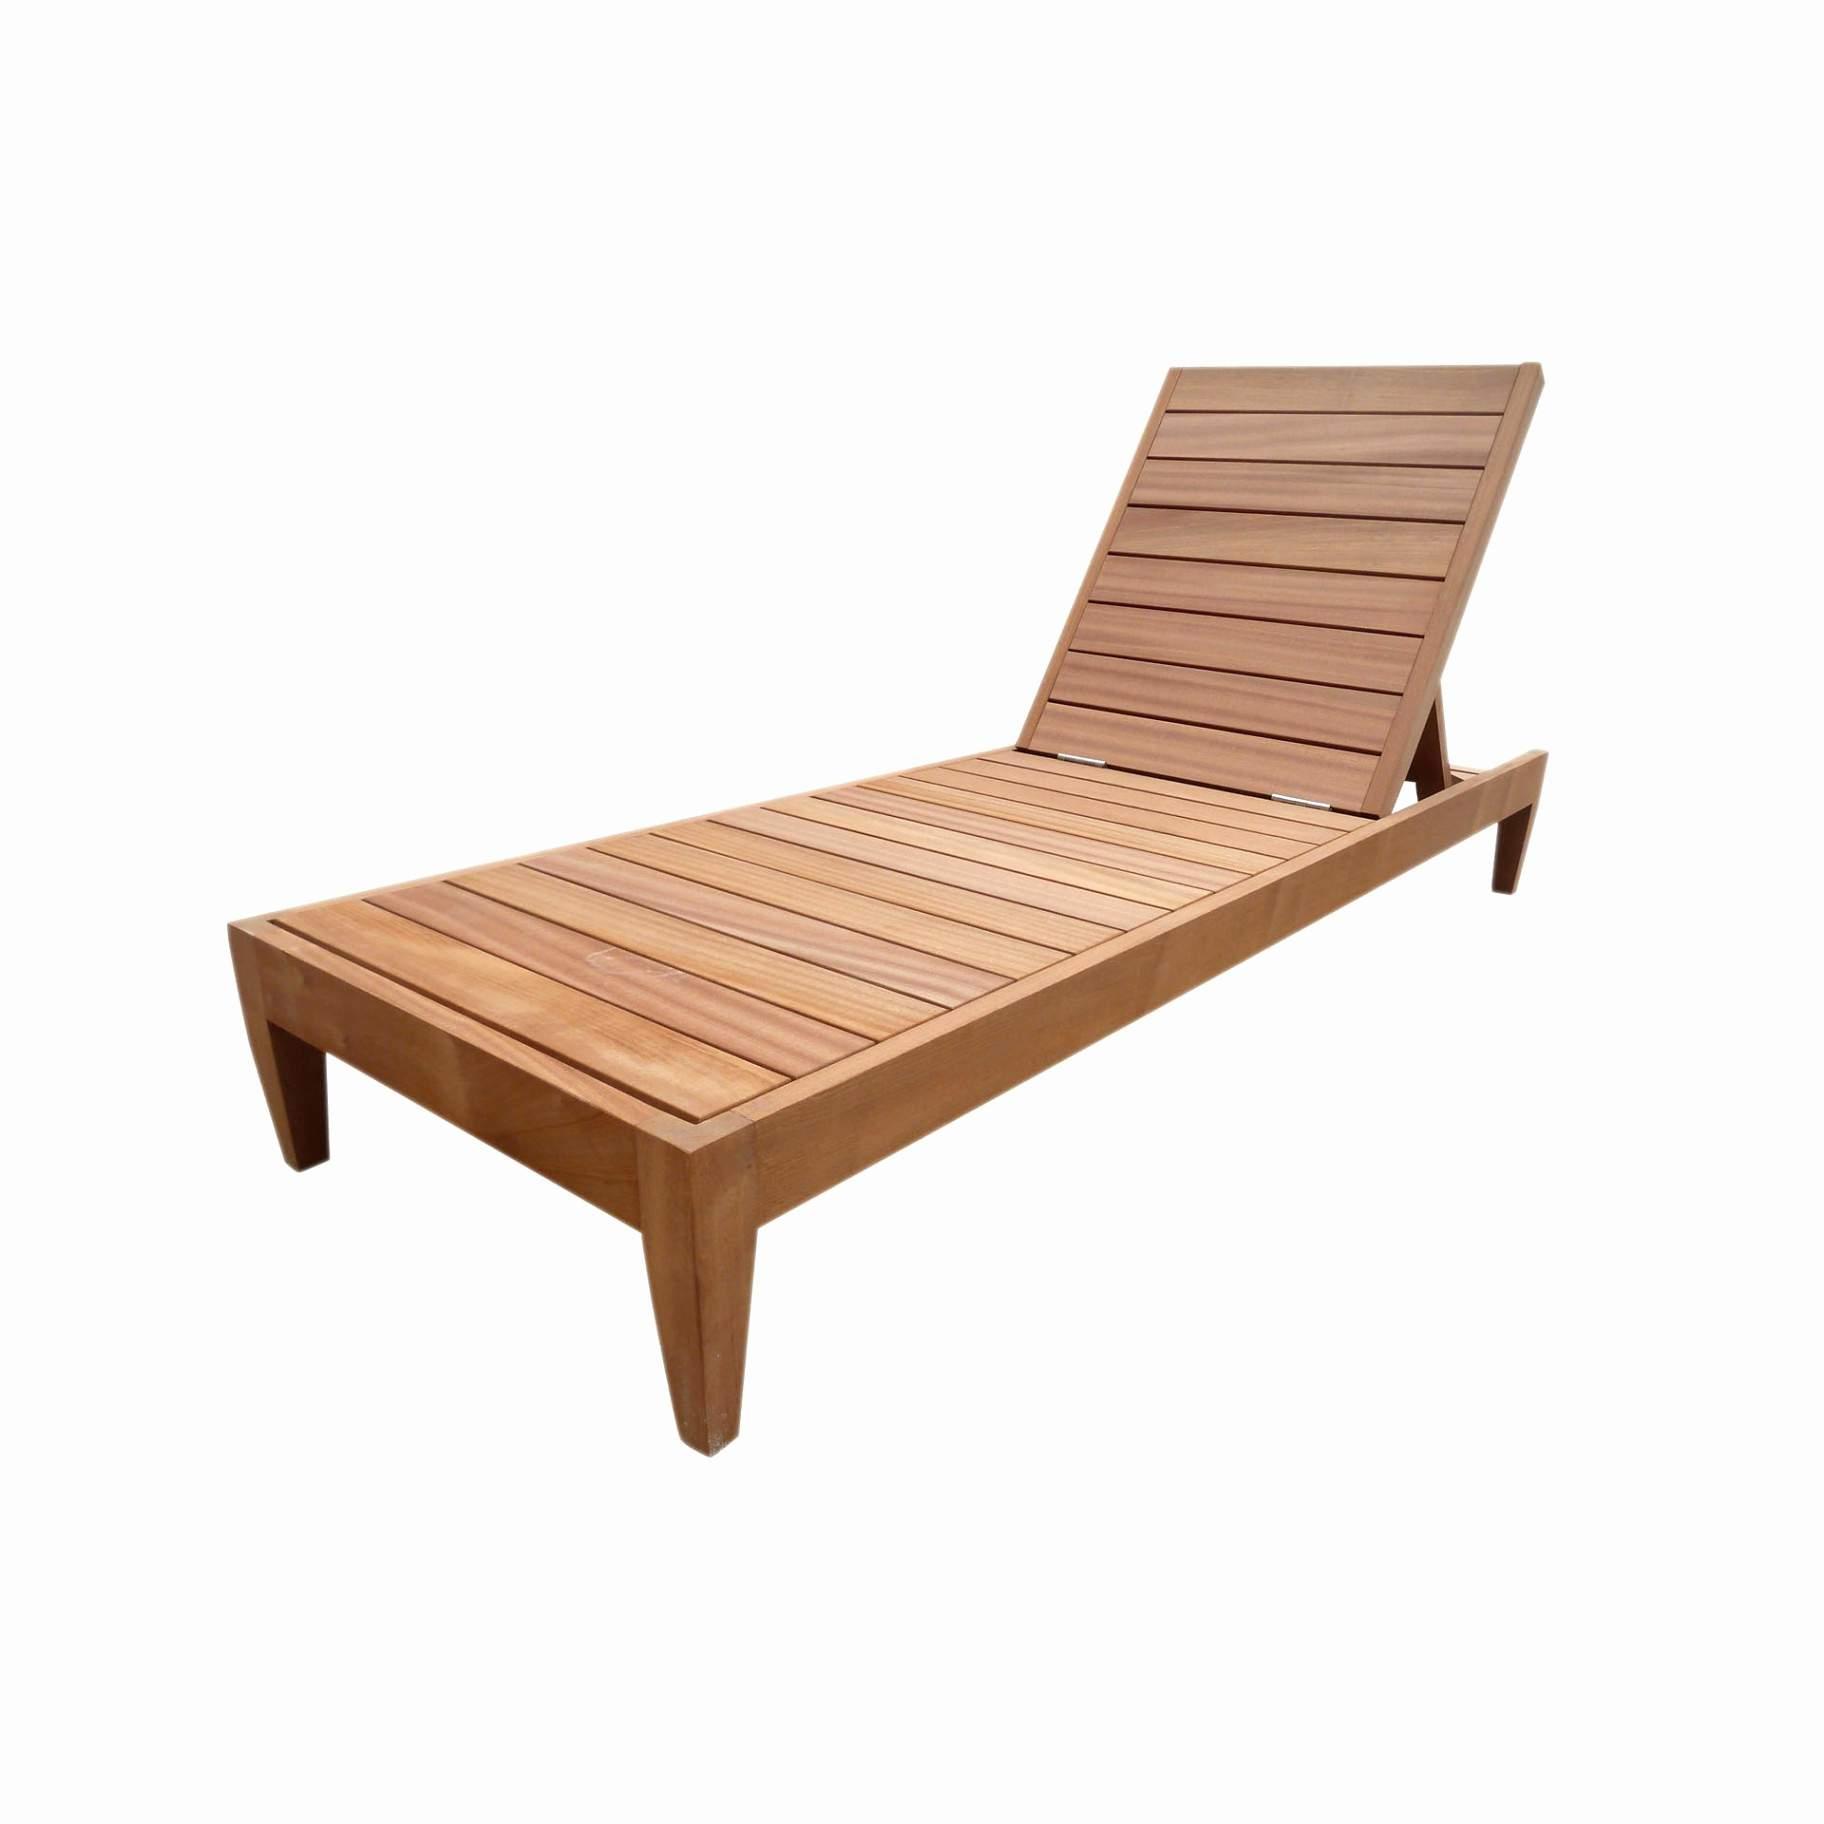 ohrensessel leder braun best vintage ledersessel braun sofa i8gbjgje of vintage ledersessel